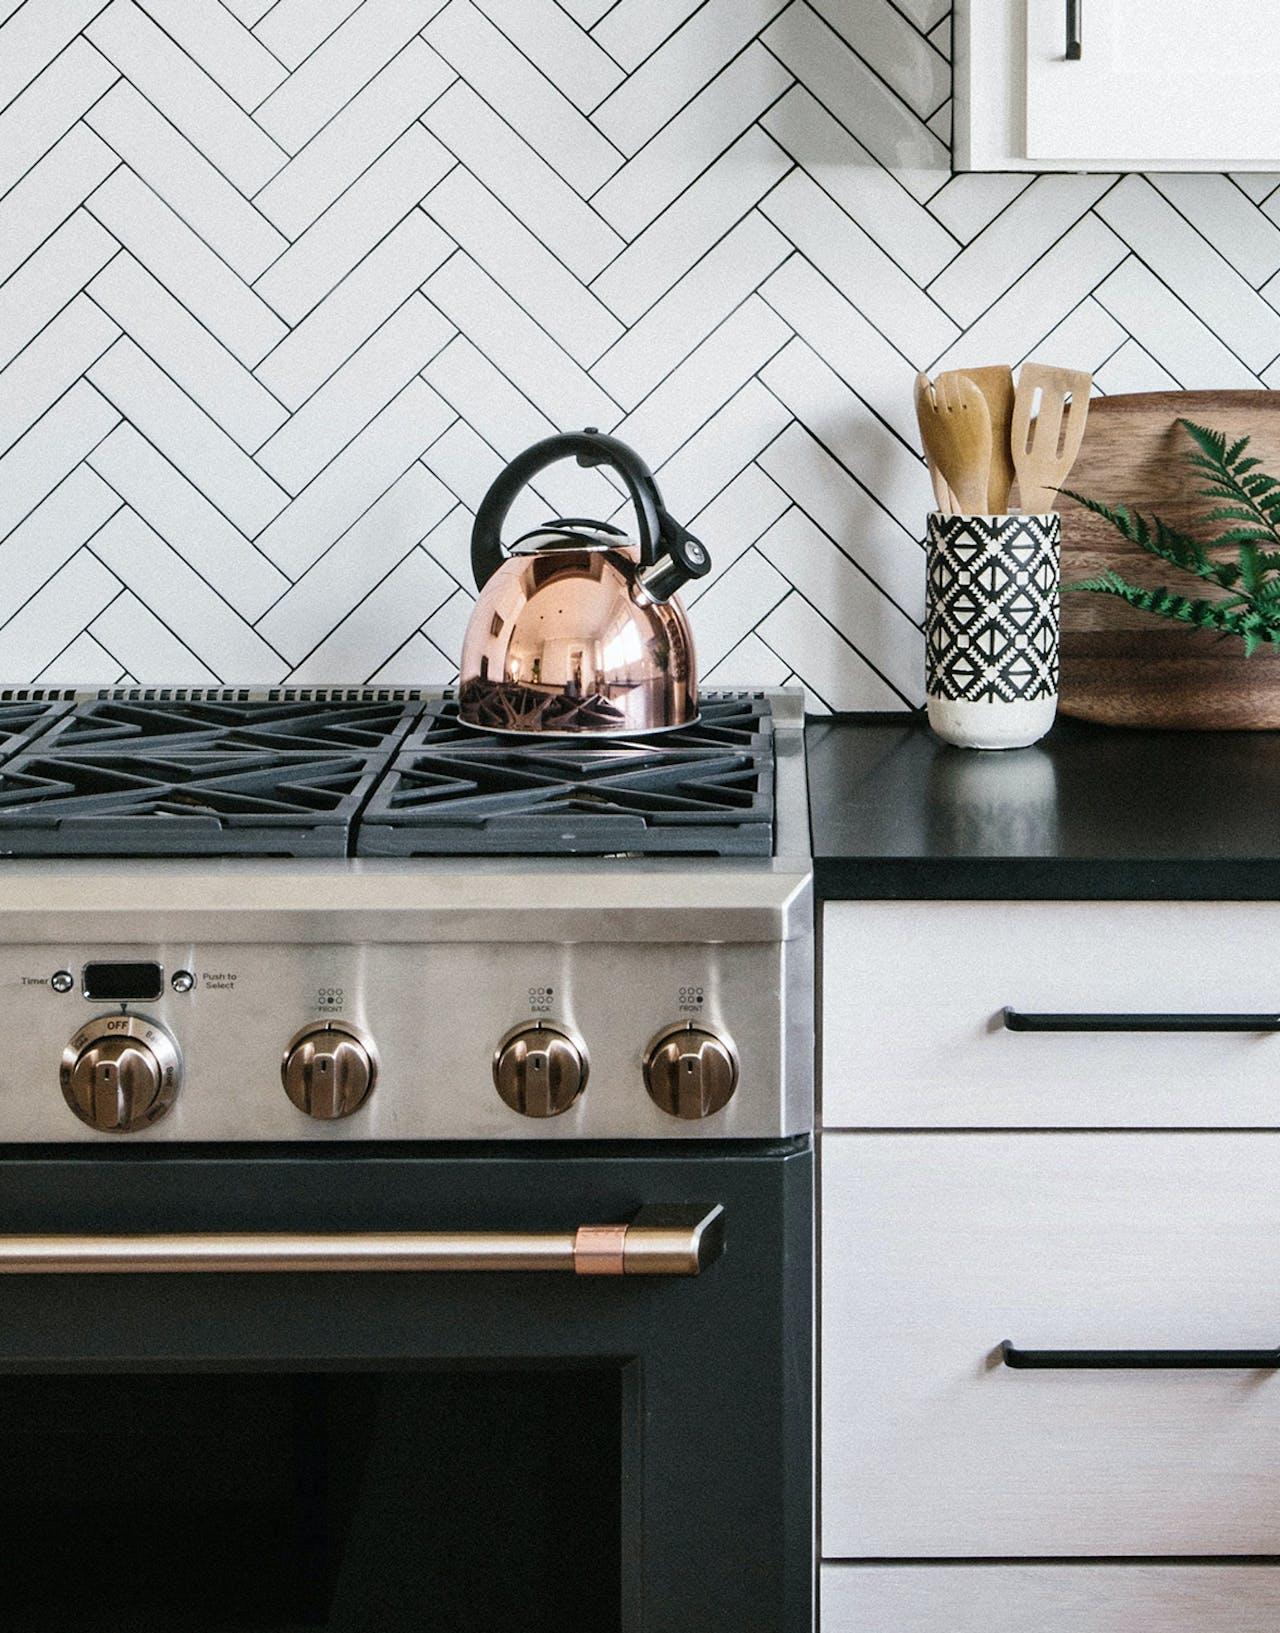 matte black professional range with copper tea kettle on top